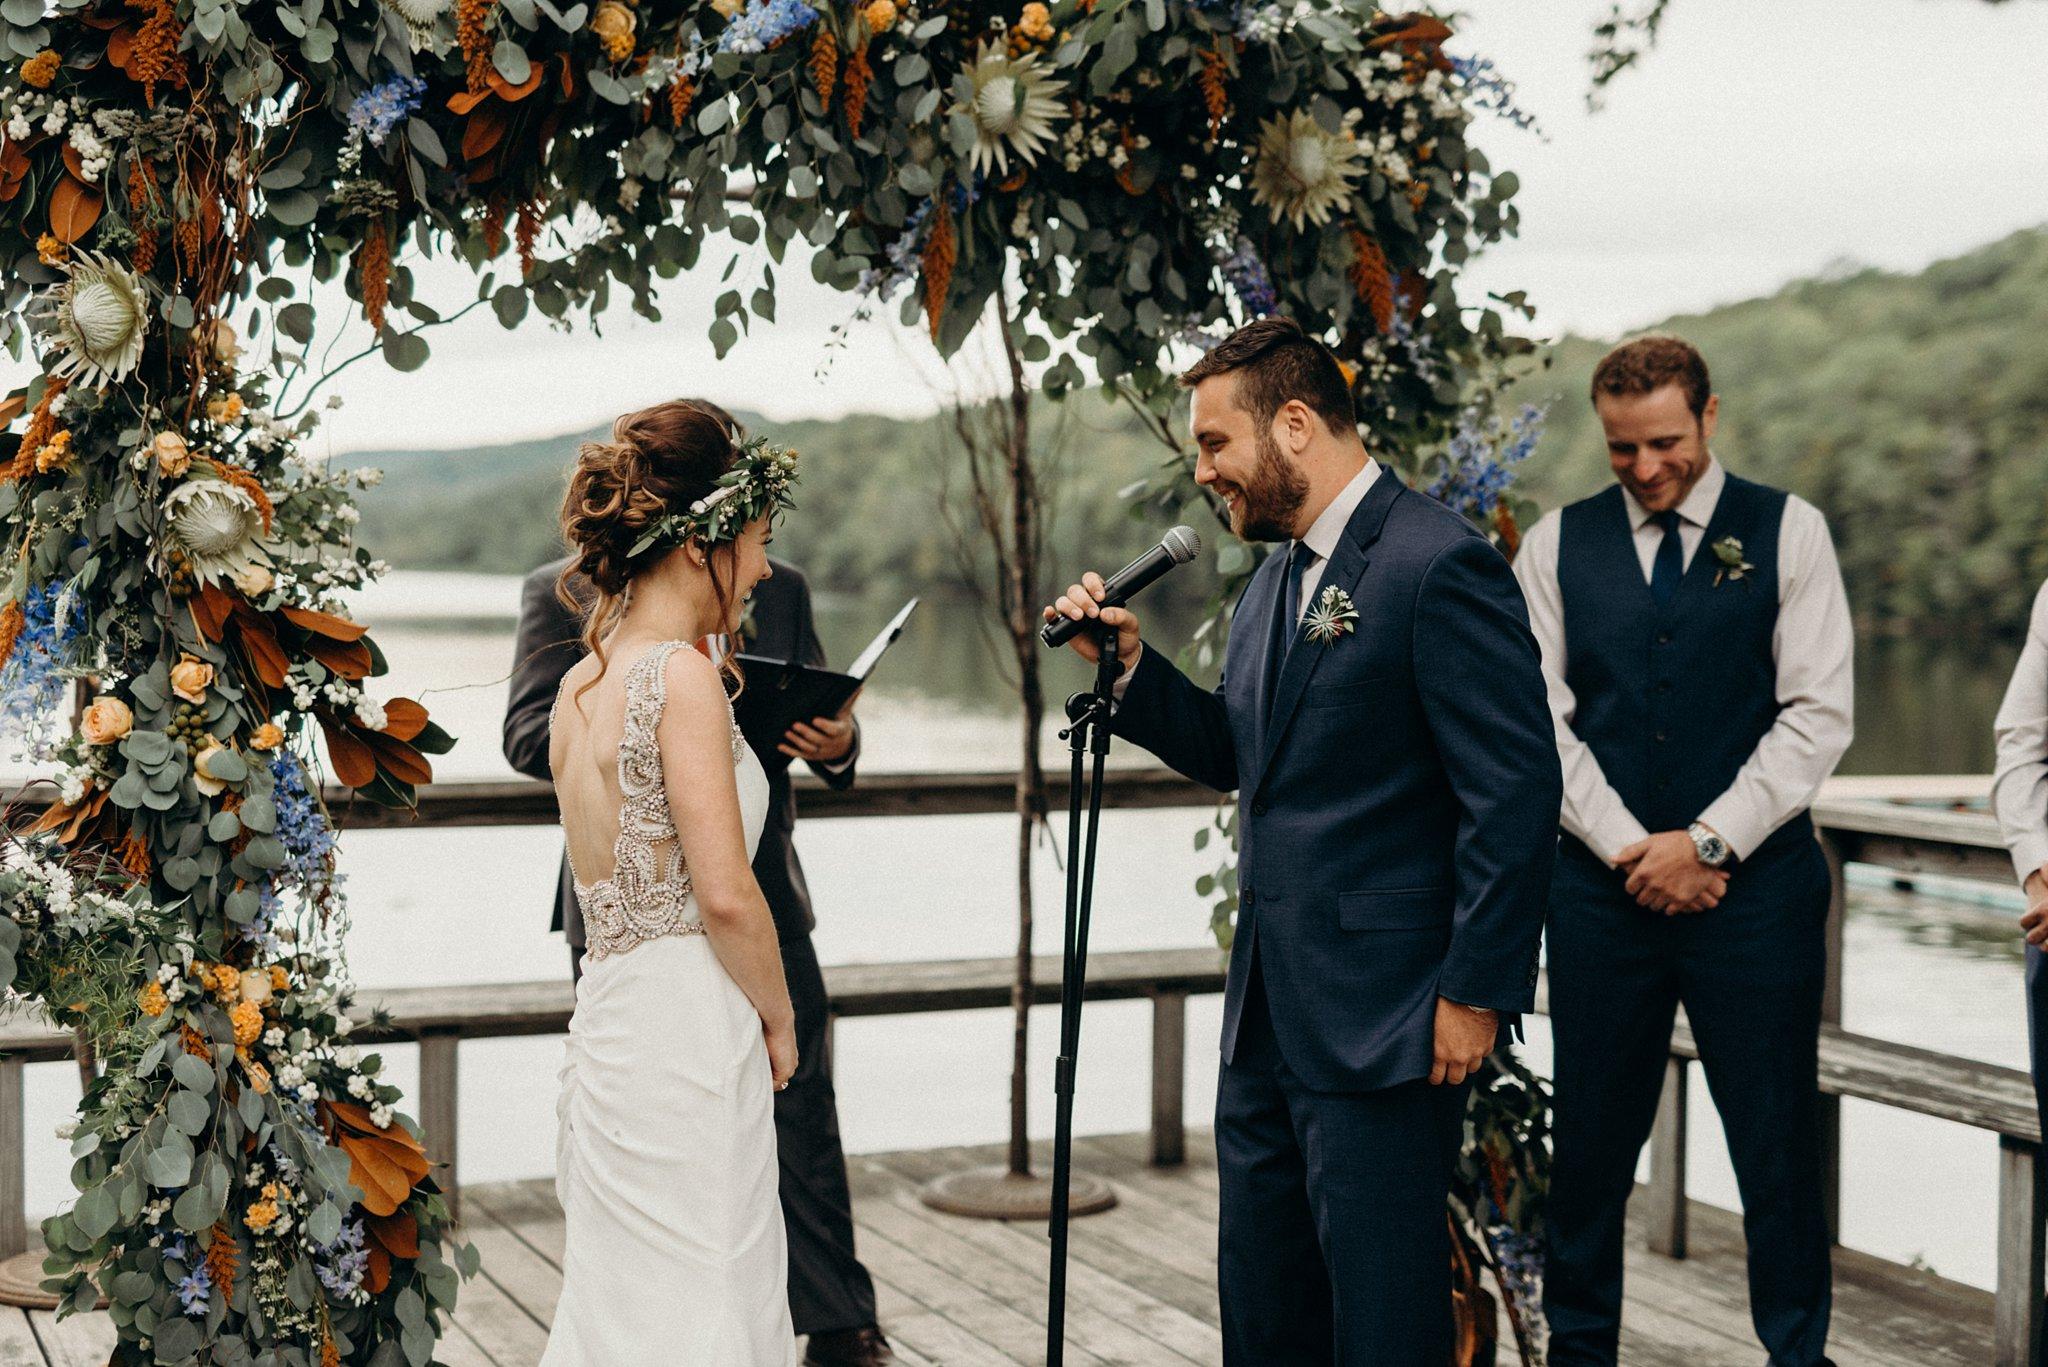 kaihla_tonai_intimate_wedding_elopement_photographer_6632.jpg